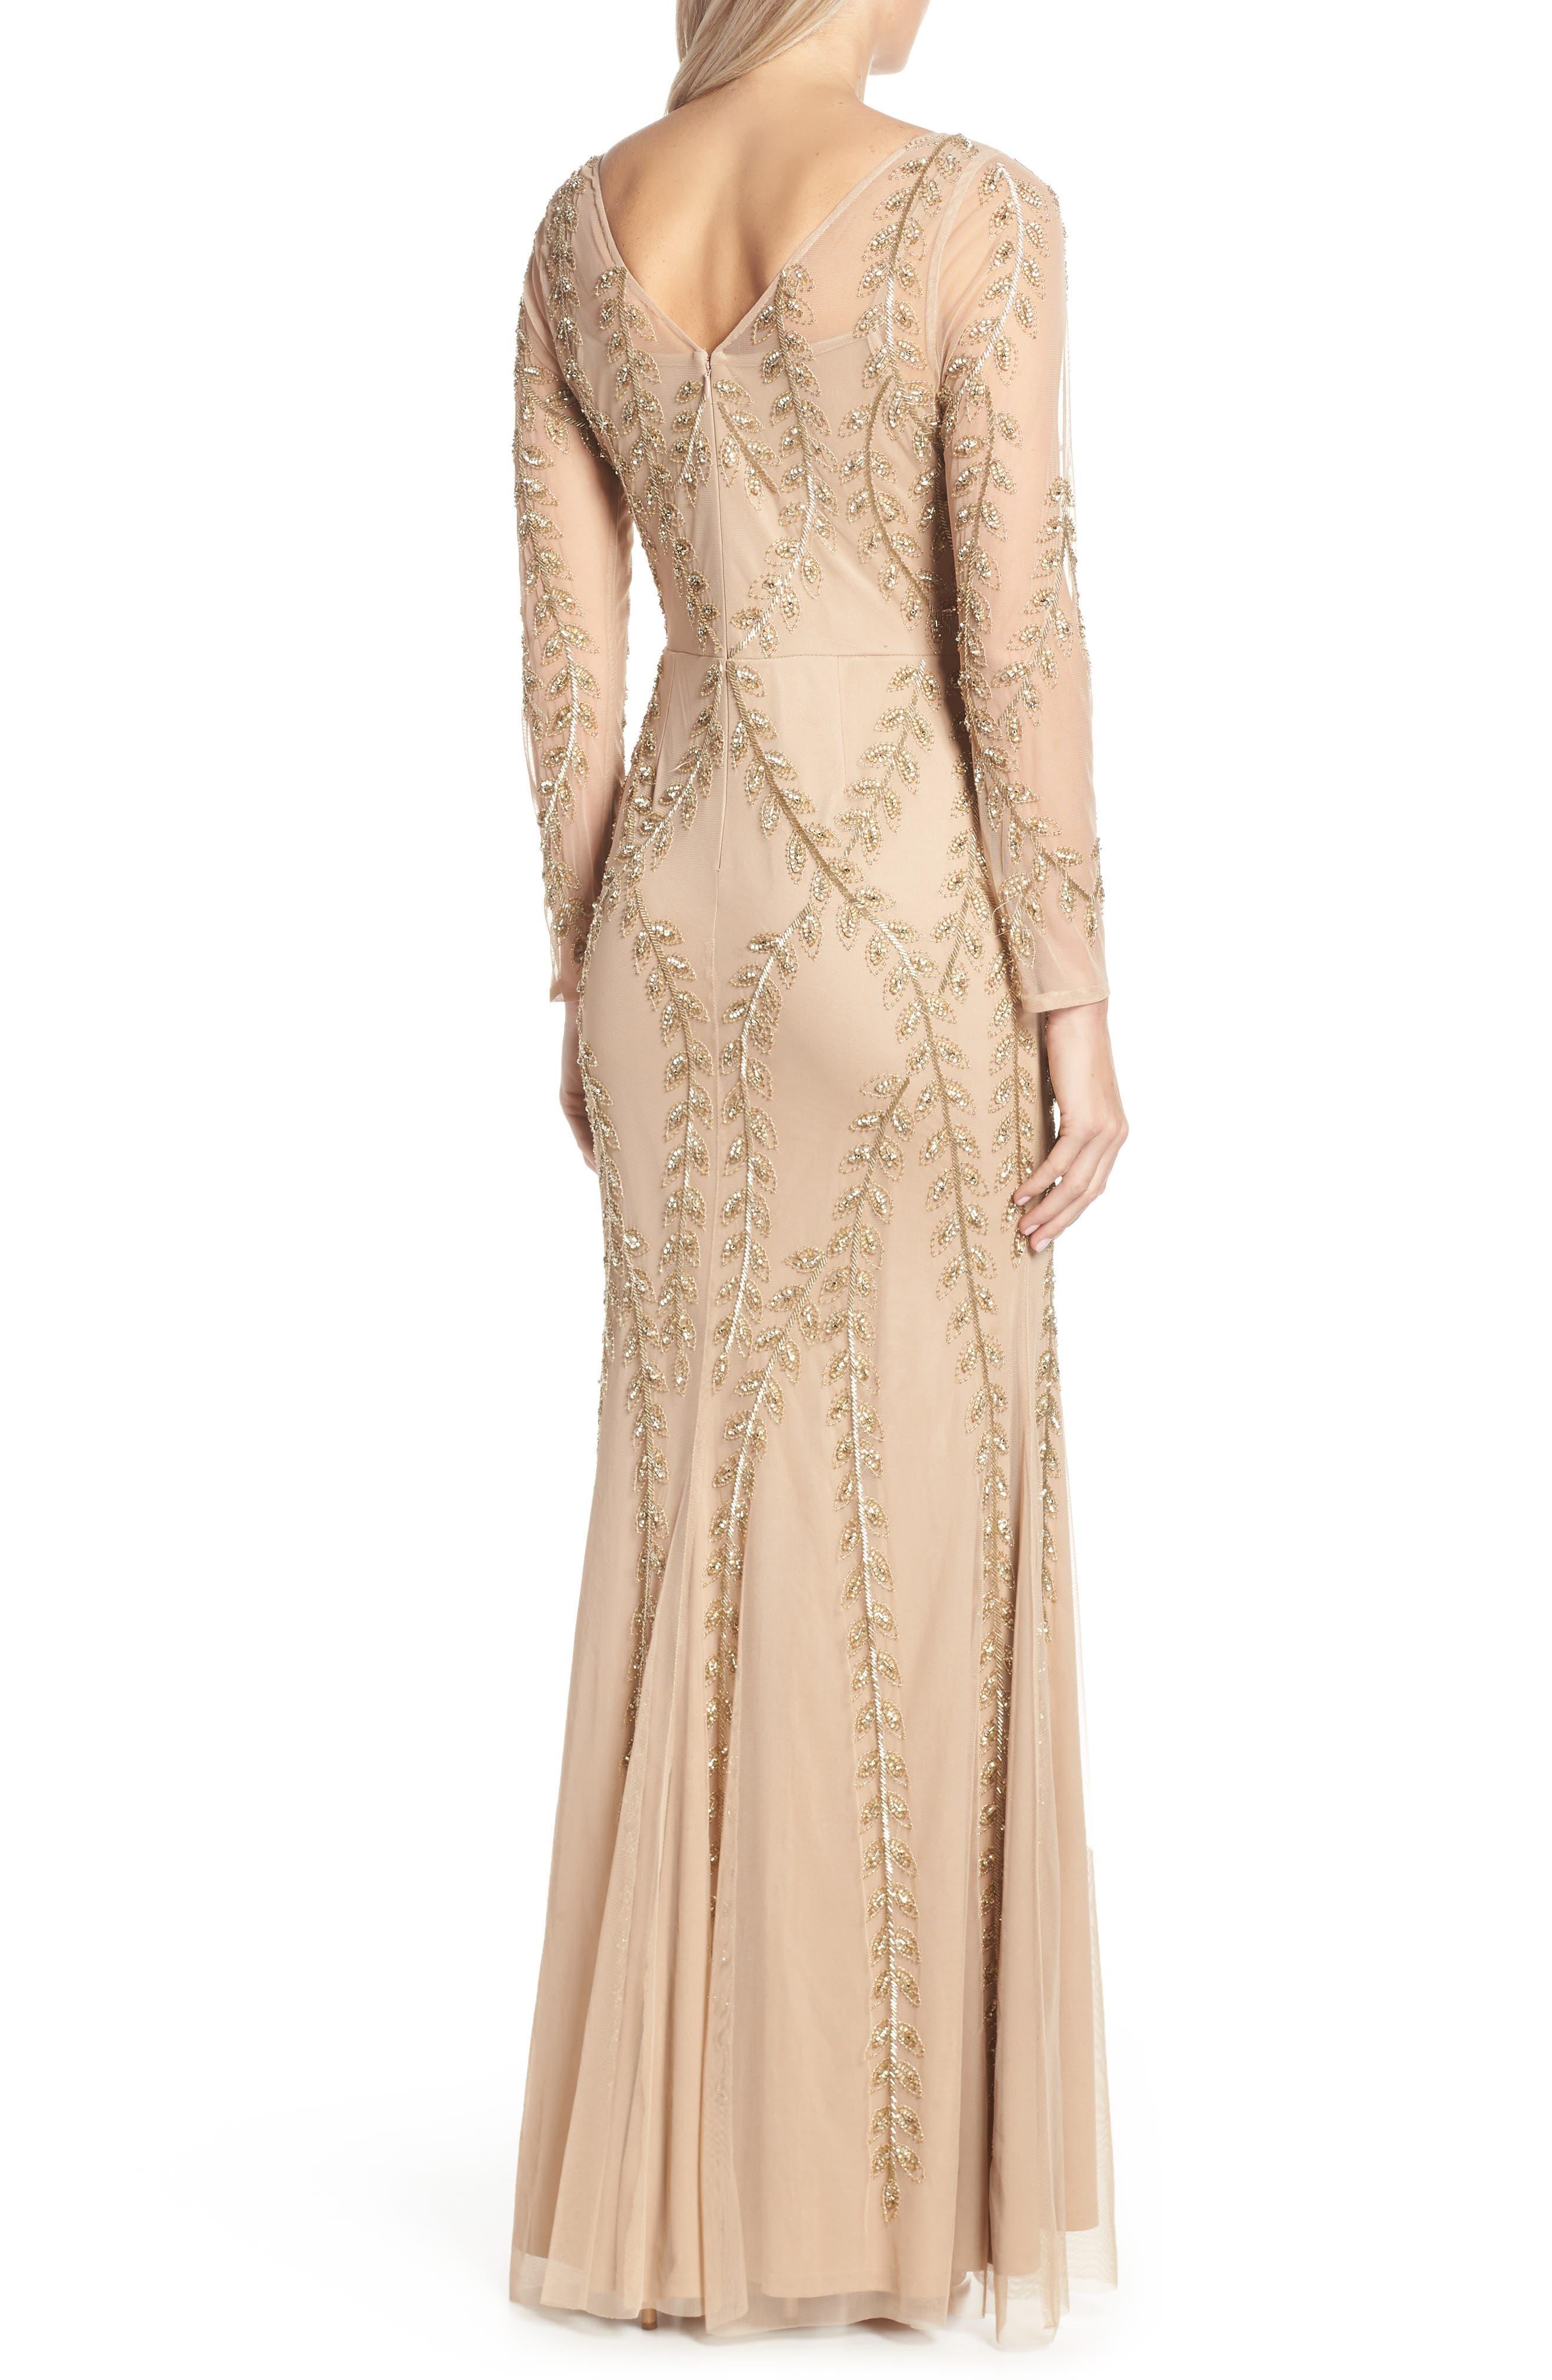 9855e8cc5dd2 Adrianna Papell Clothing